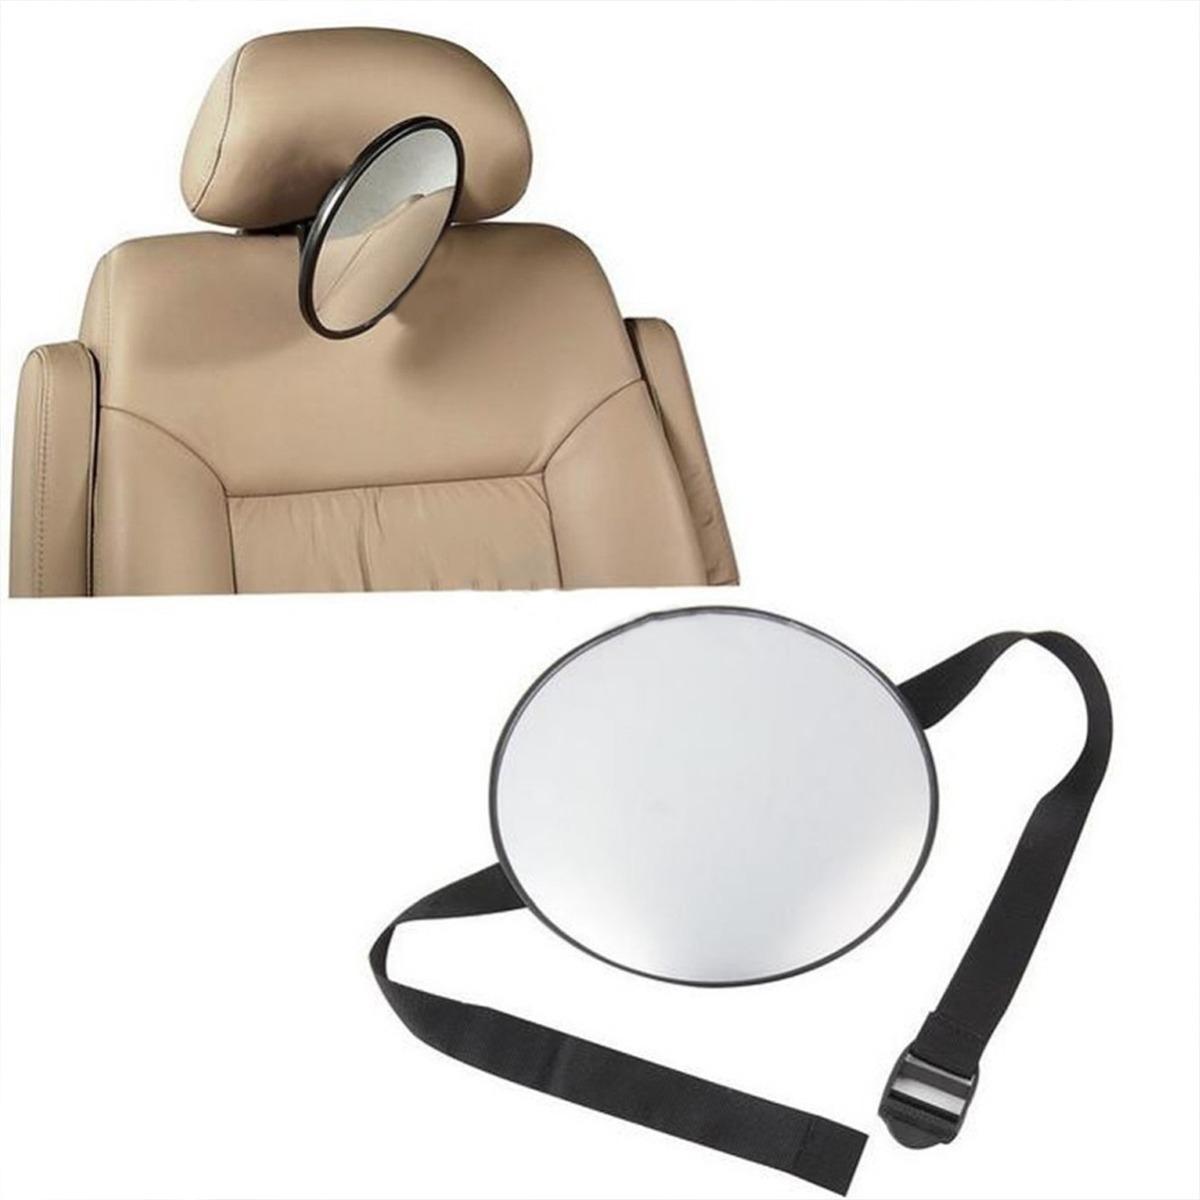 Espejo Revisor Para Bebe Asiento Trasero Auto Coche B3005